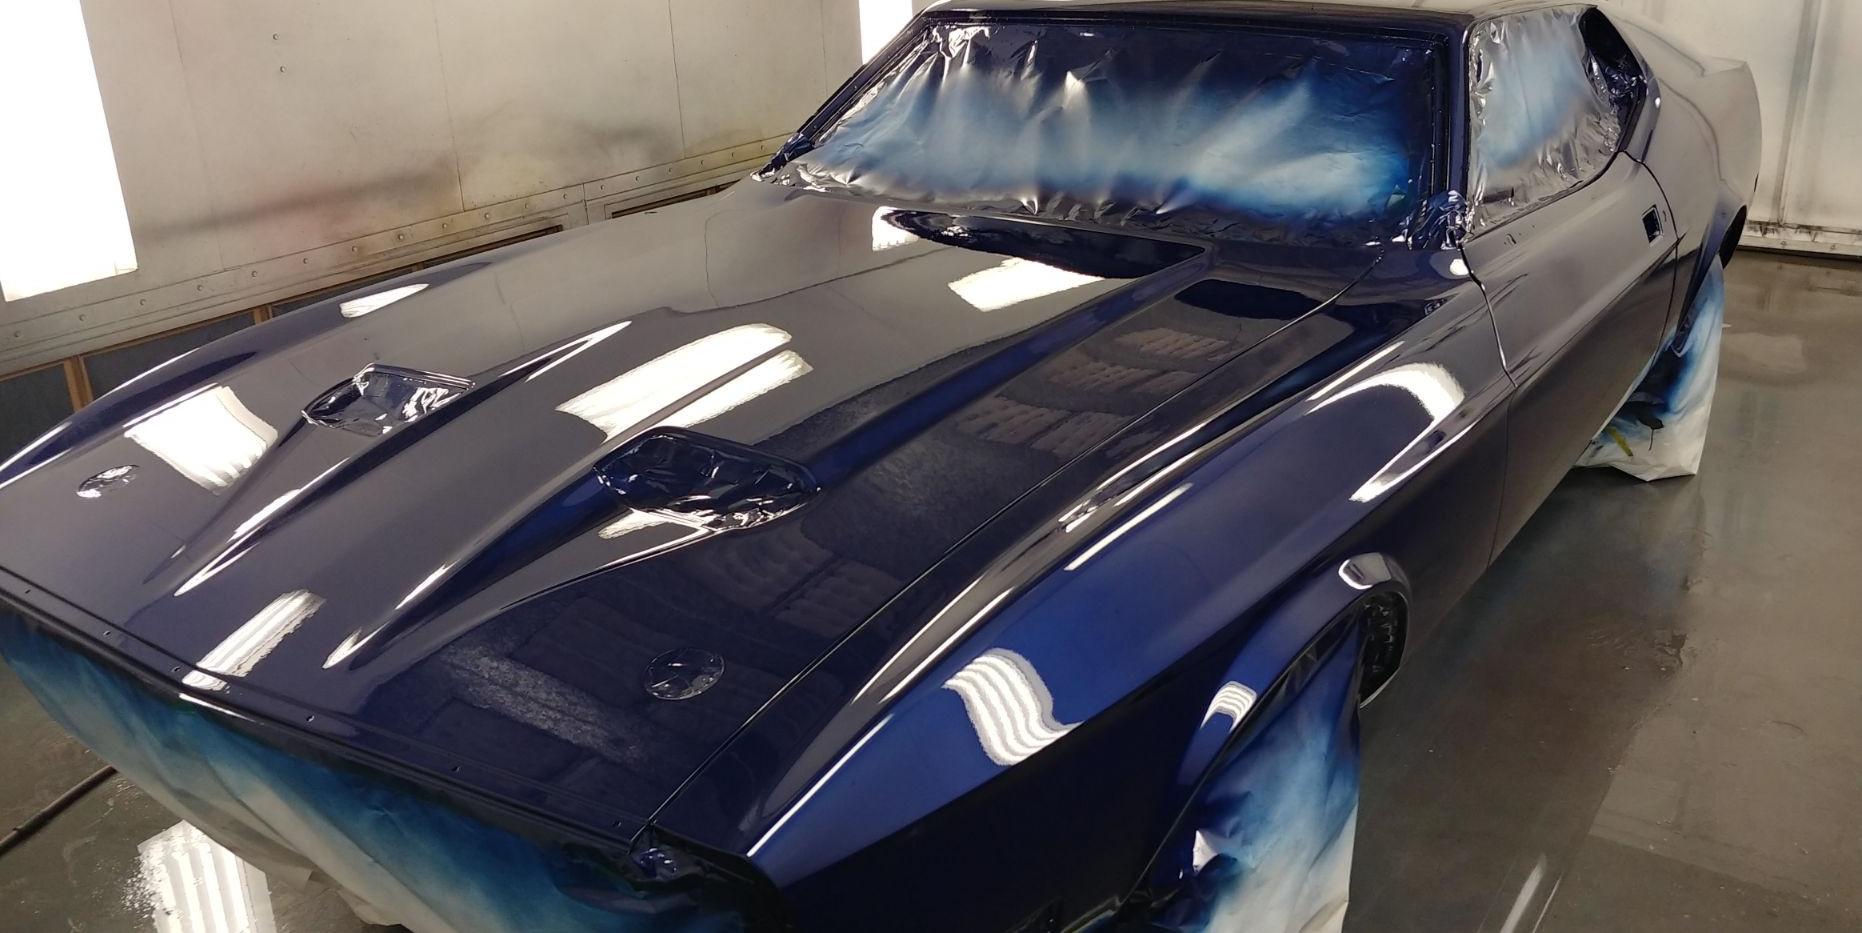 1973 Mustang -paint job